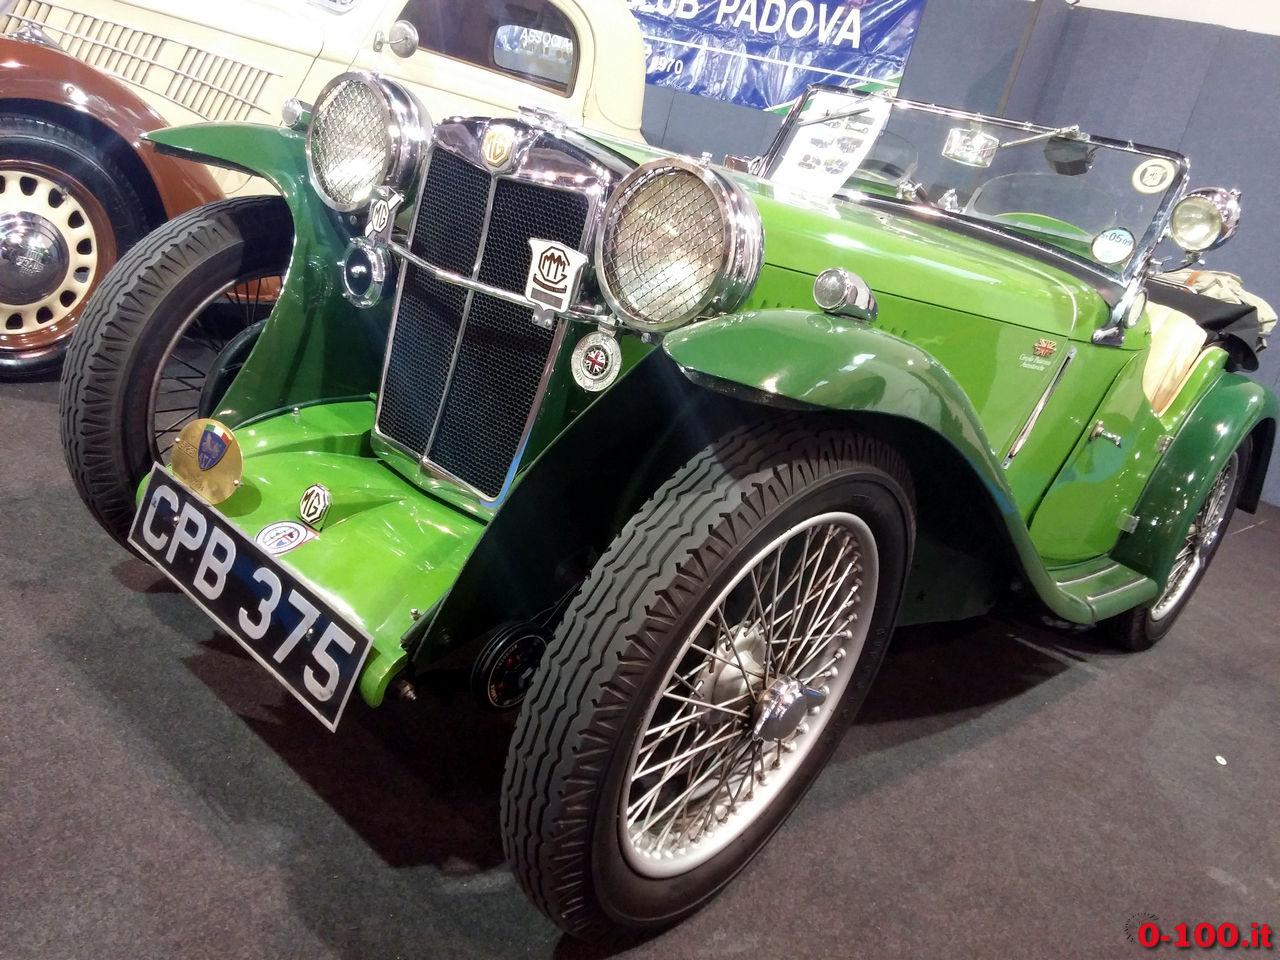 automotodepoca-2016-mg-car-market-mercato-auto-prezzo-price_0-10026